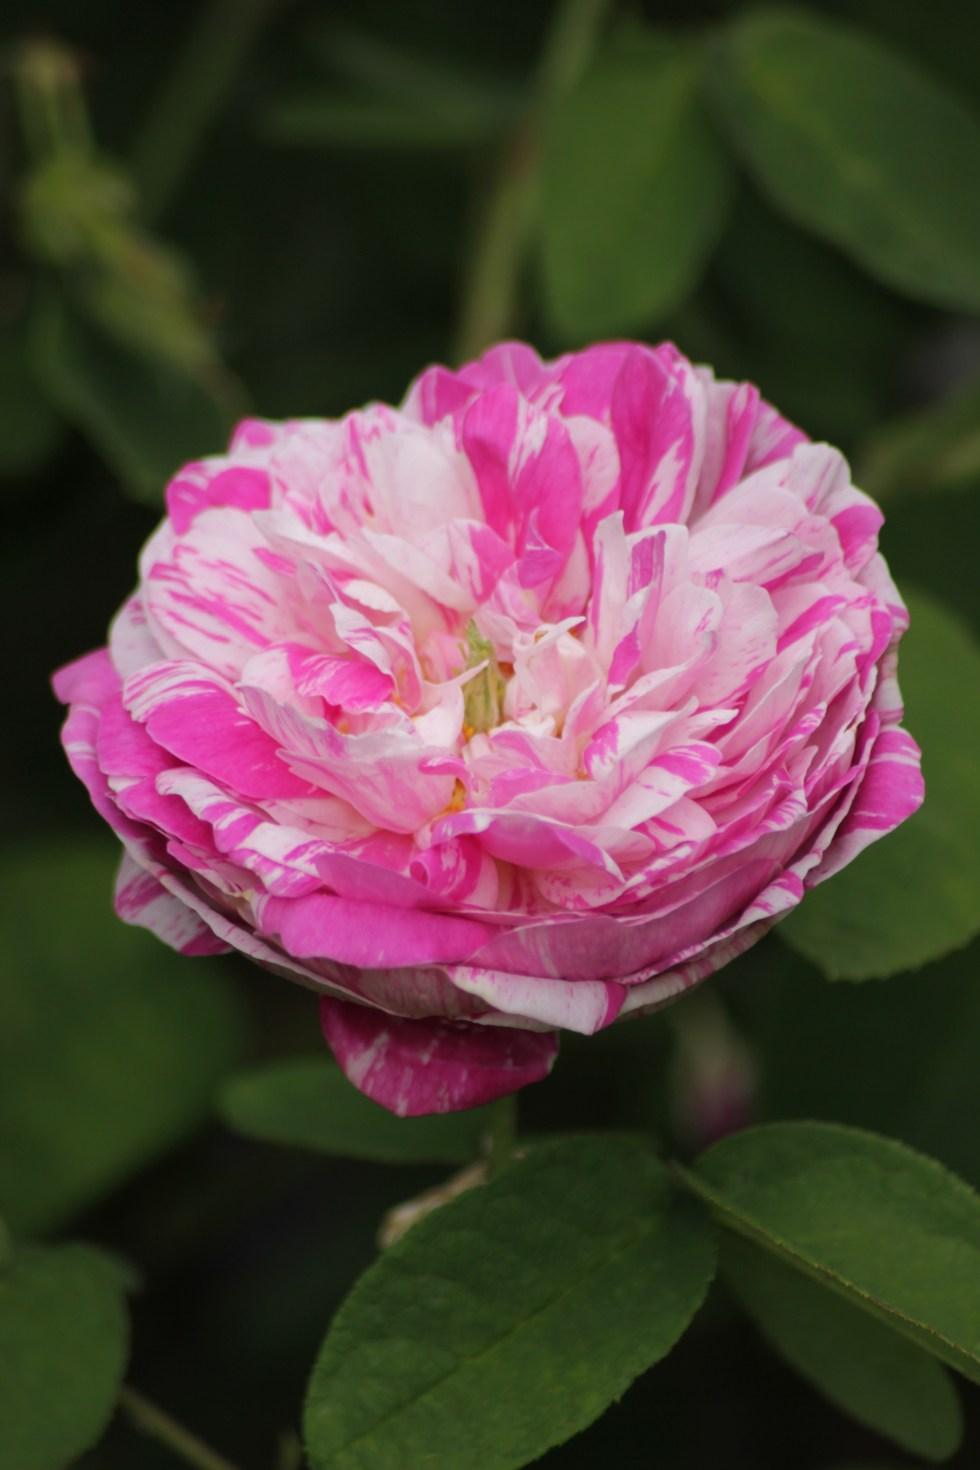 rosa camuyeux Gallica roses, forgotten gems